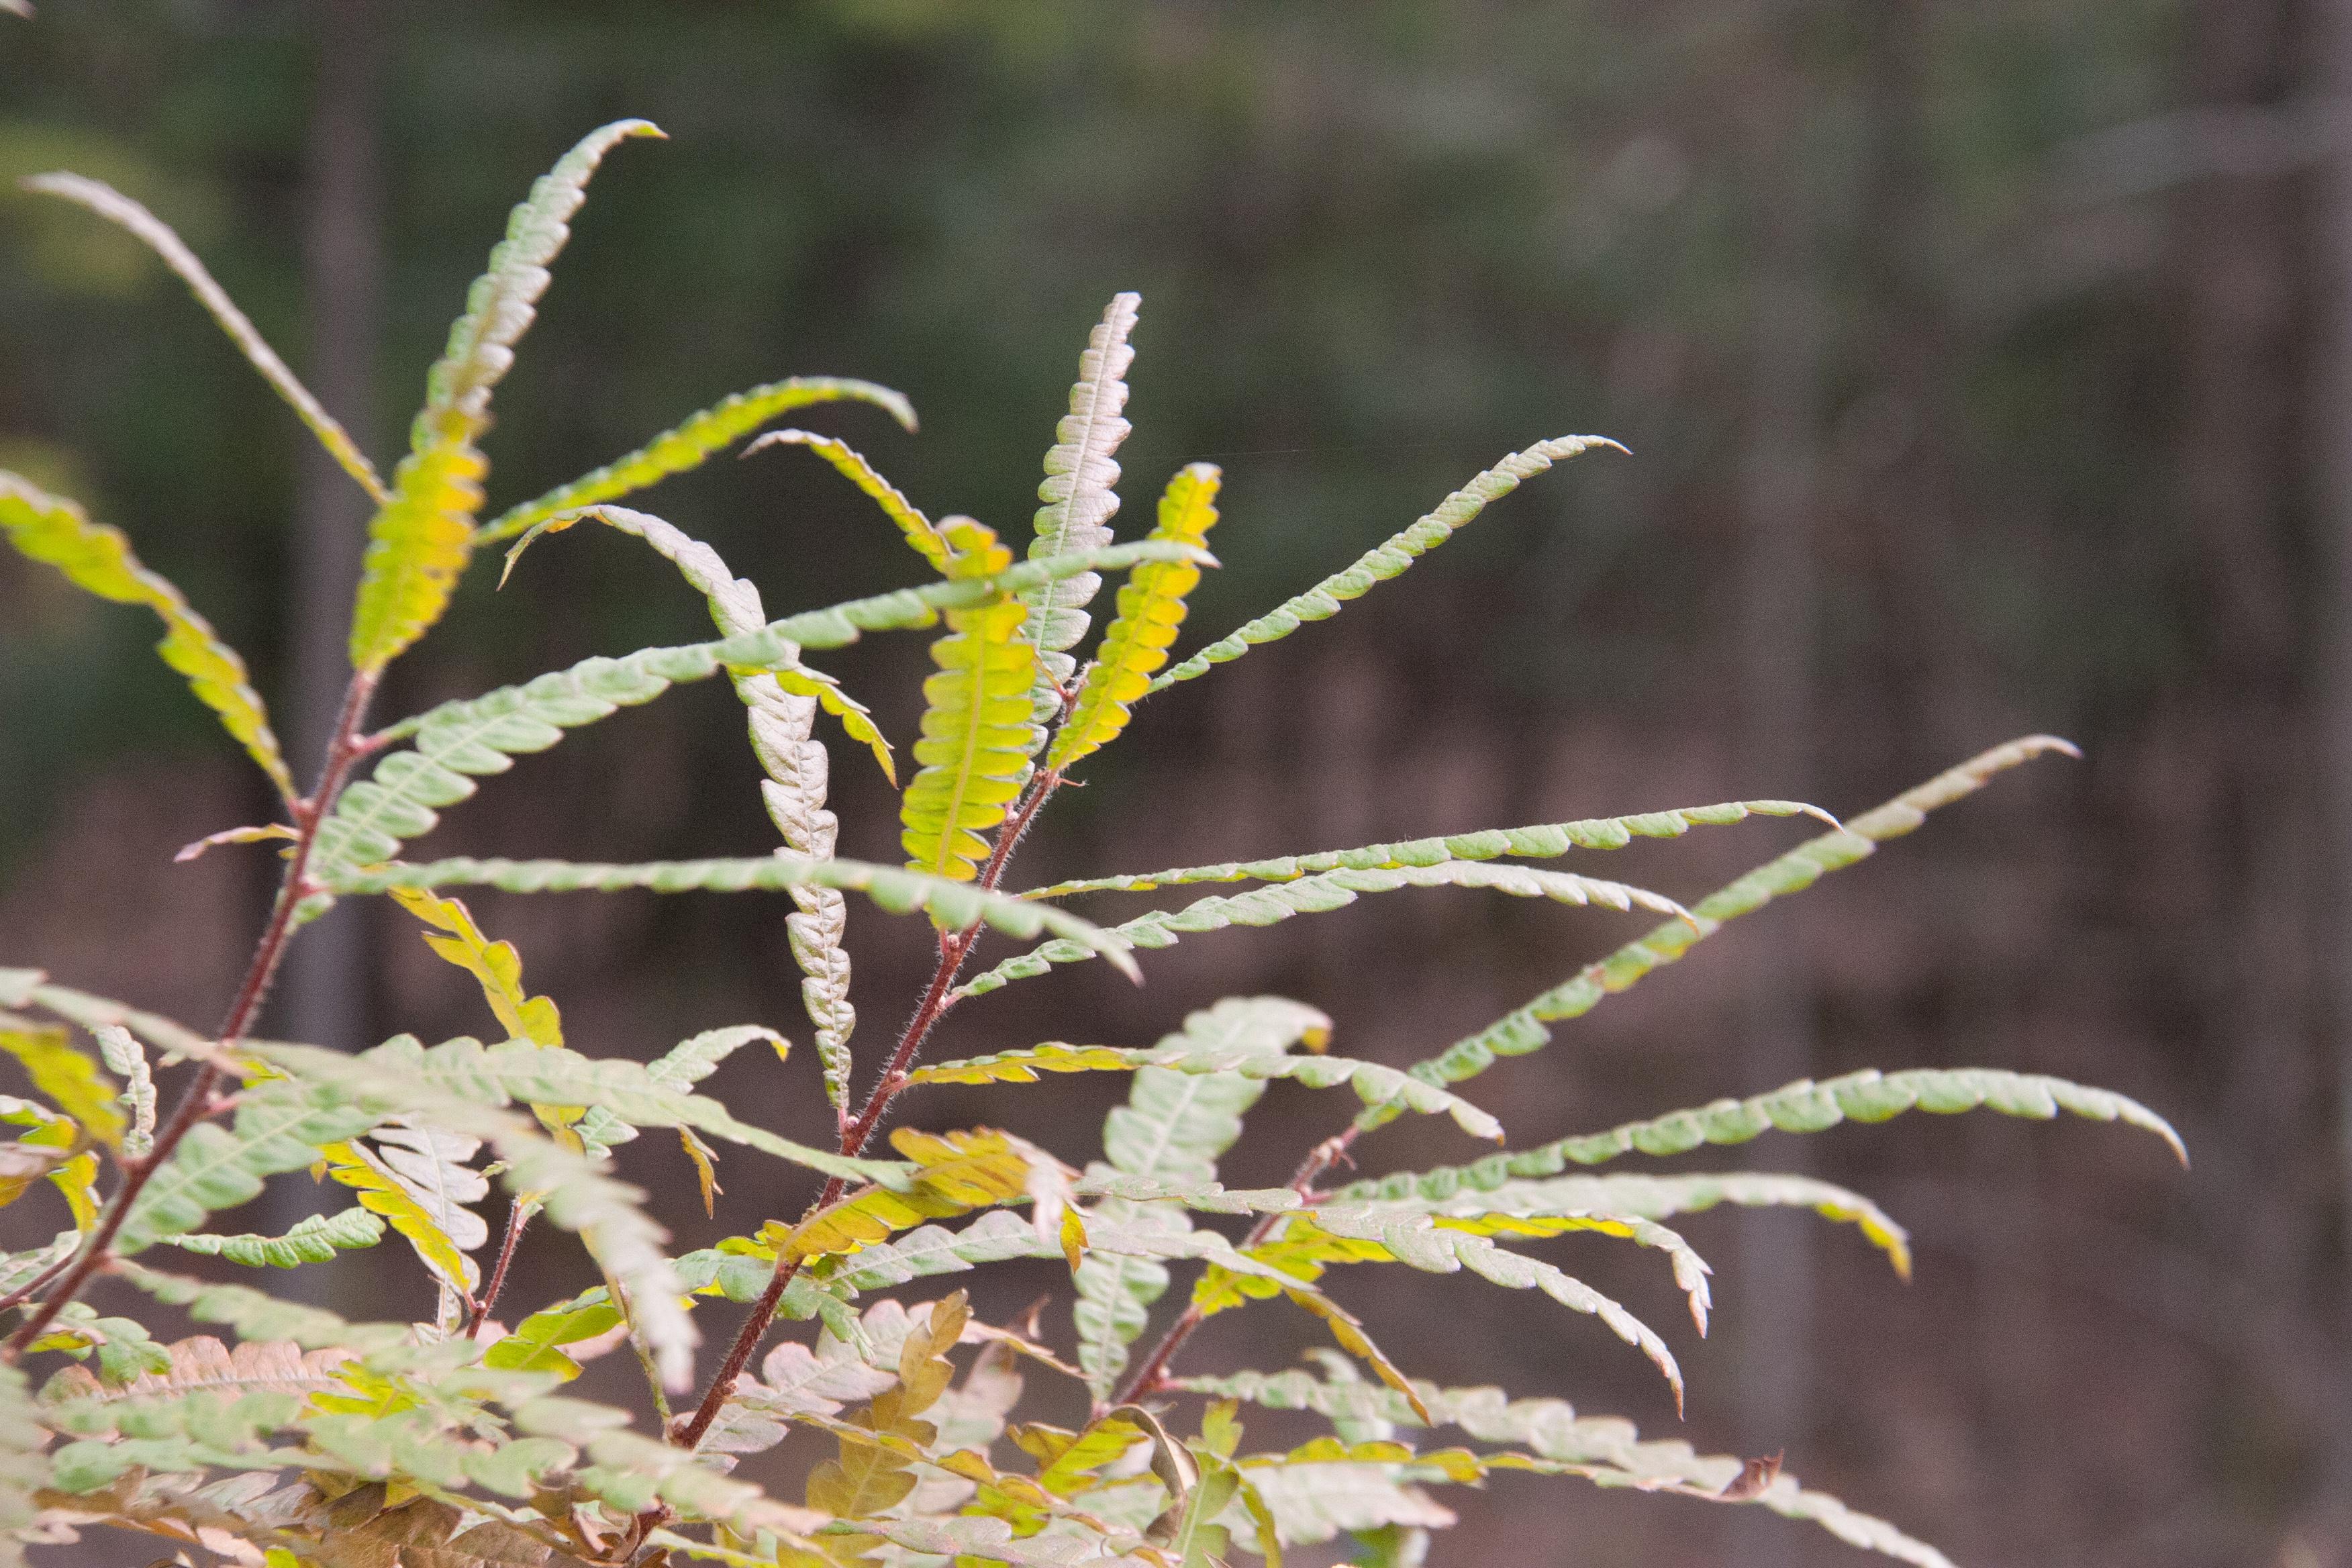 Sweet Fern, aka Comptonia peregrina